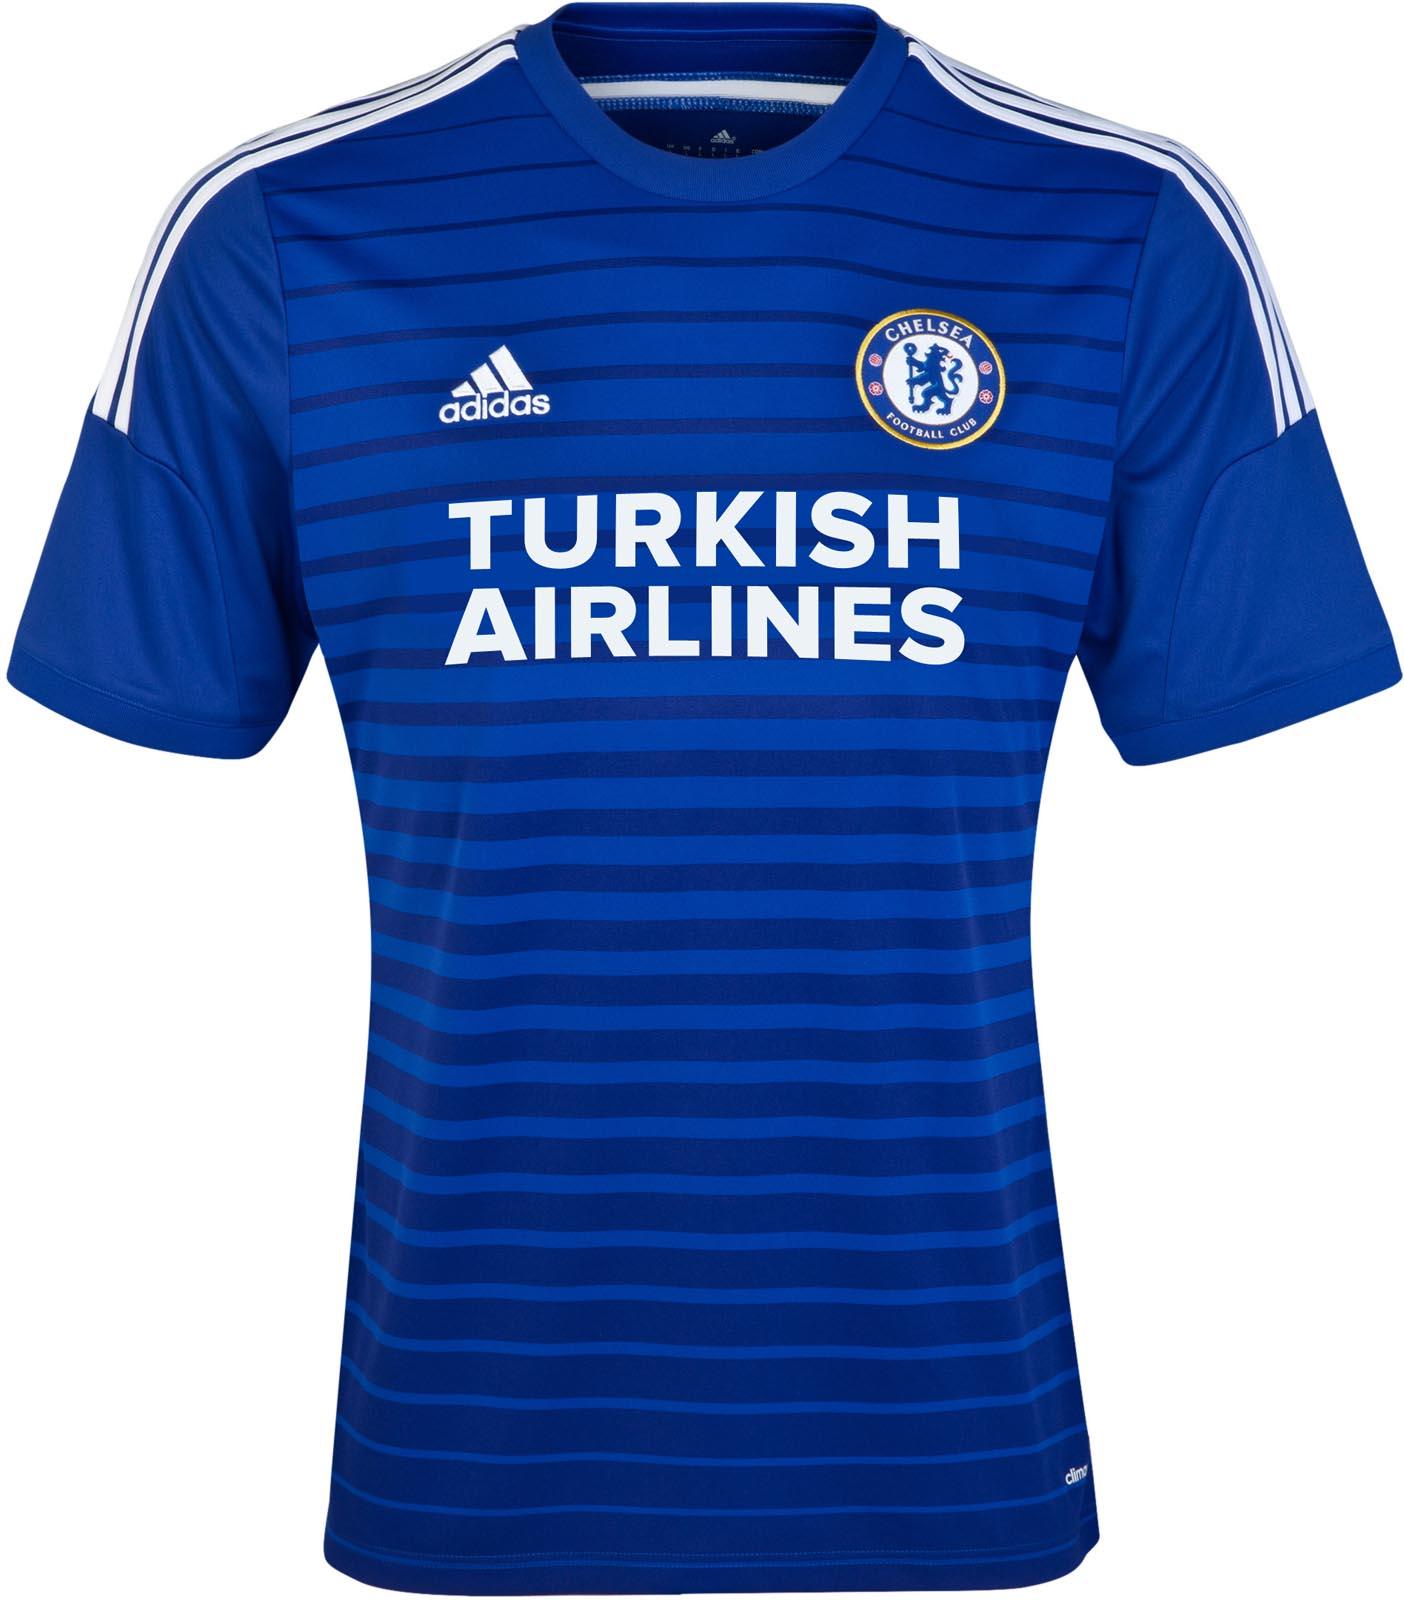 chelsea-turkish-airlines-sponsor